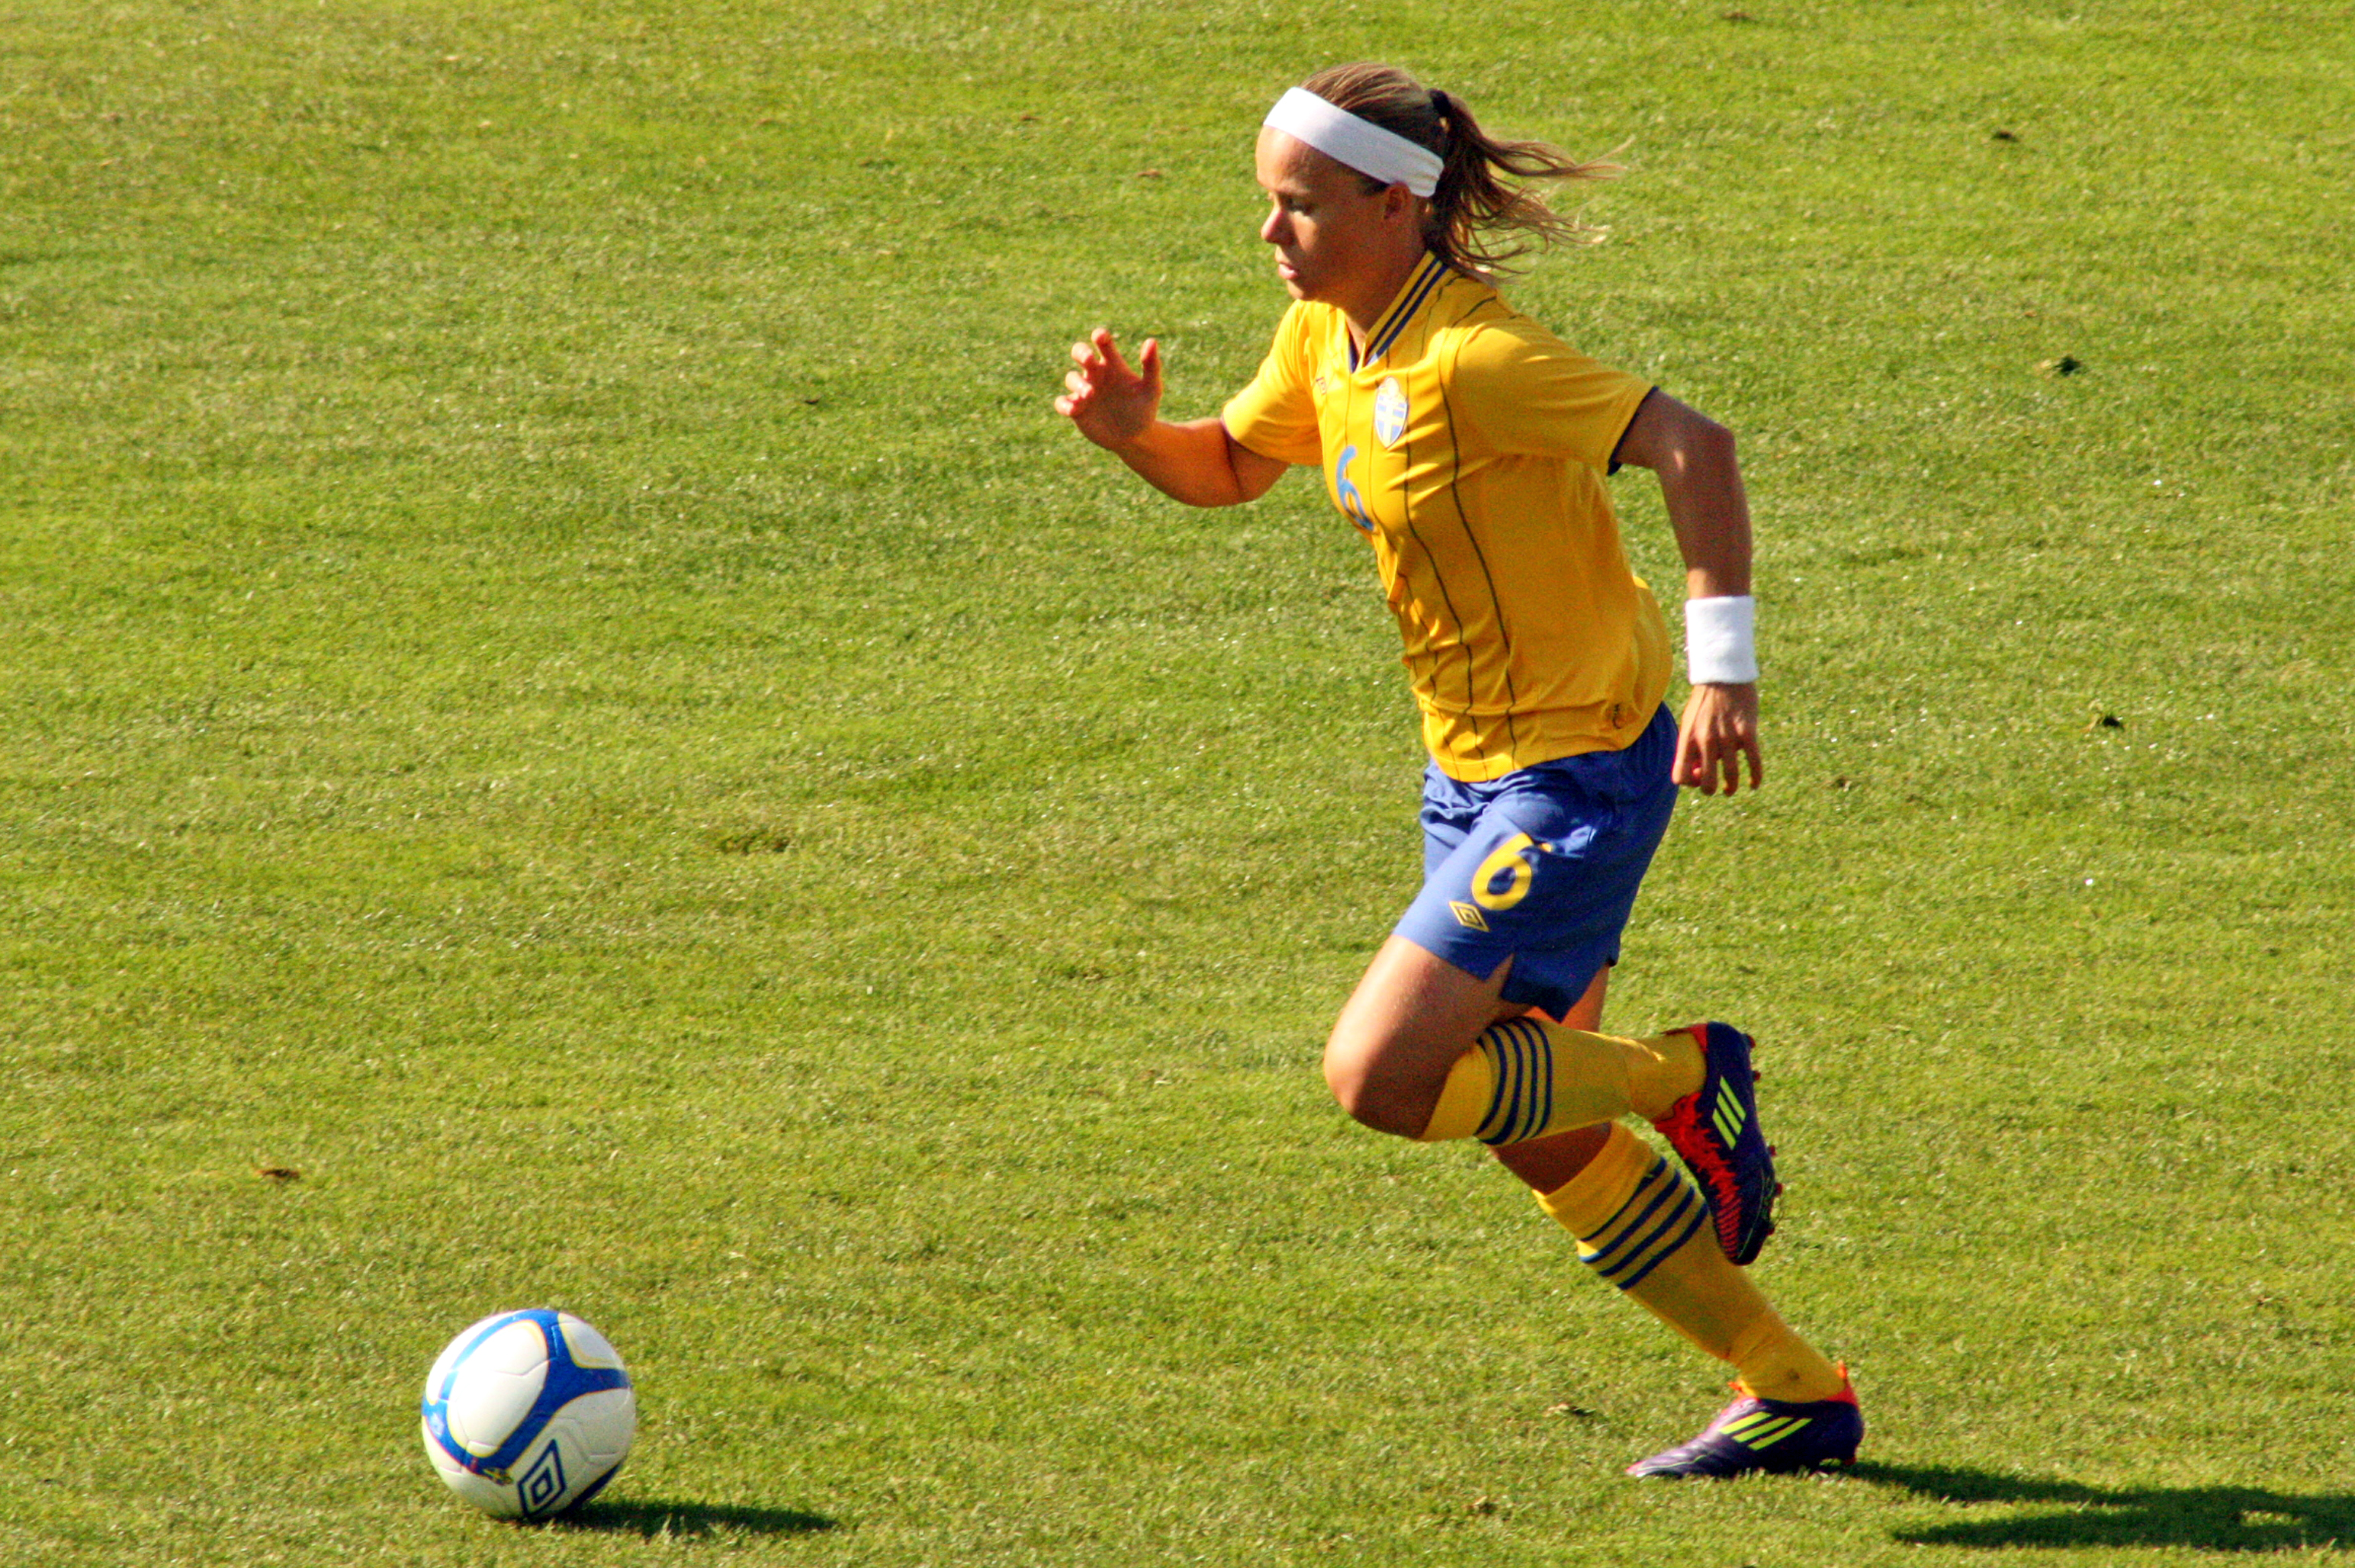 VM i fotboll 2011  a7a7849e4b591